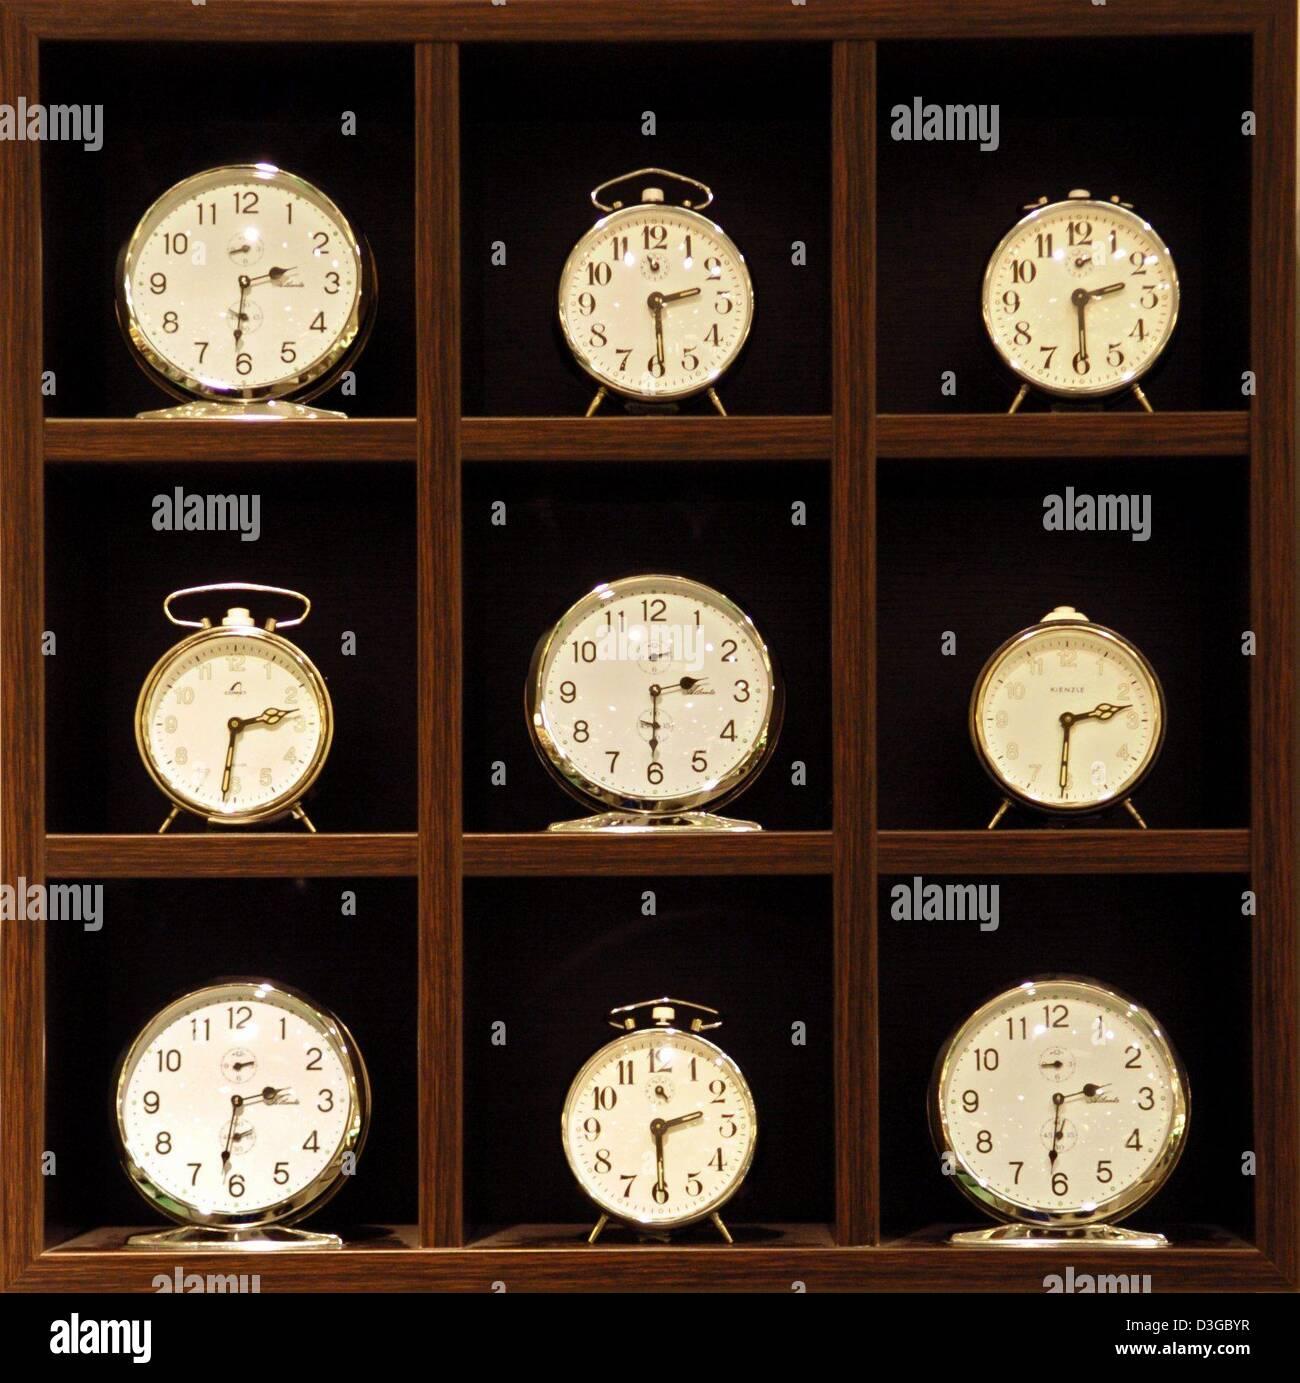 Radio Controlled Clocks Stock Photos Amp Radio Controlled